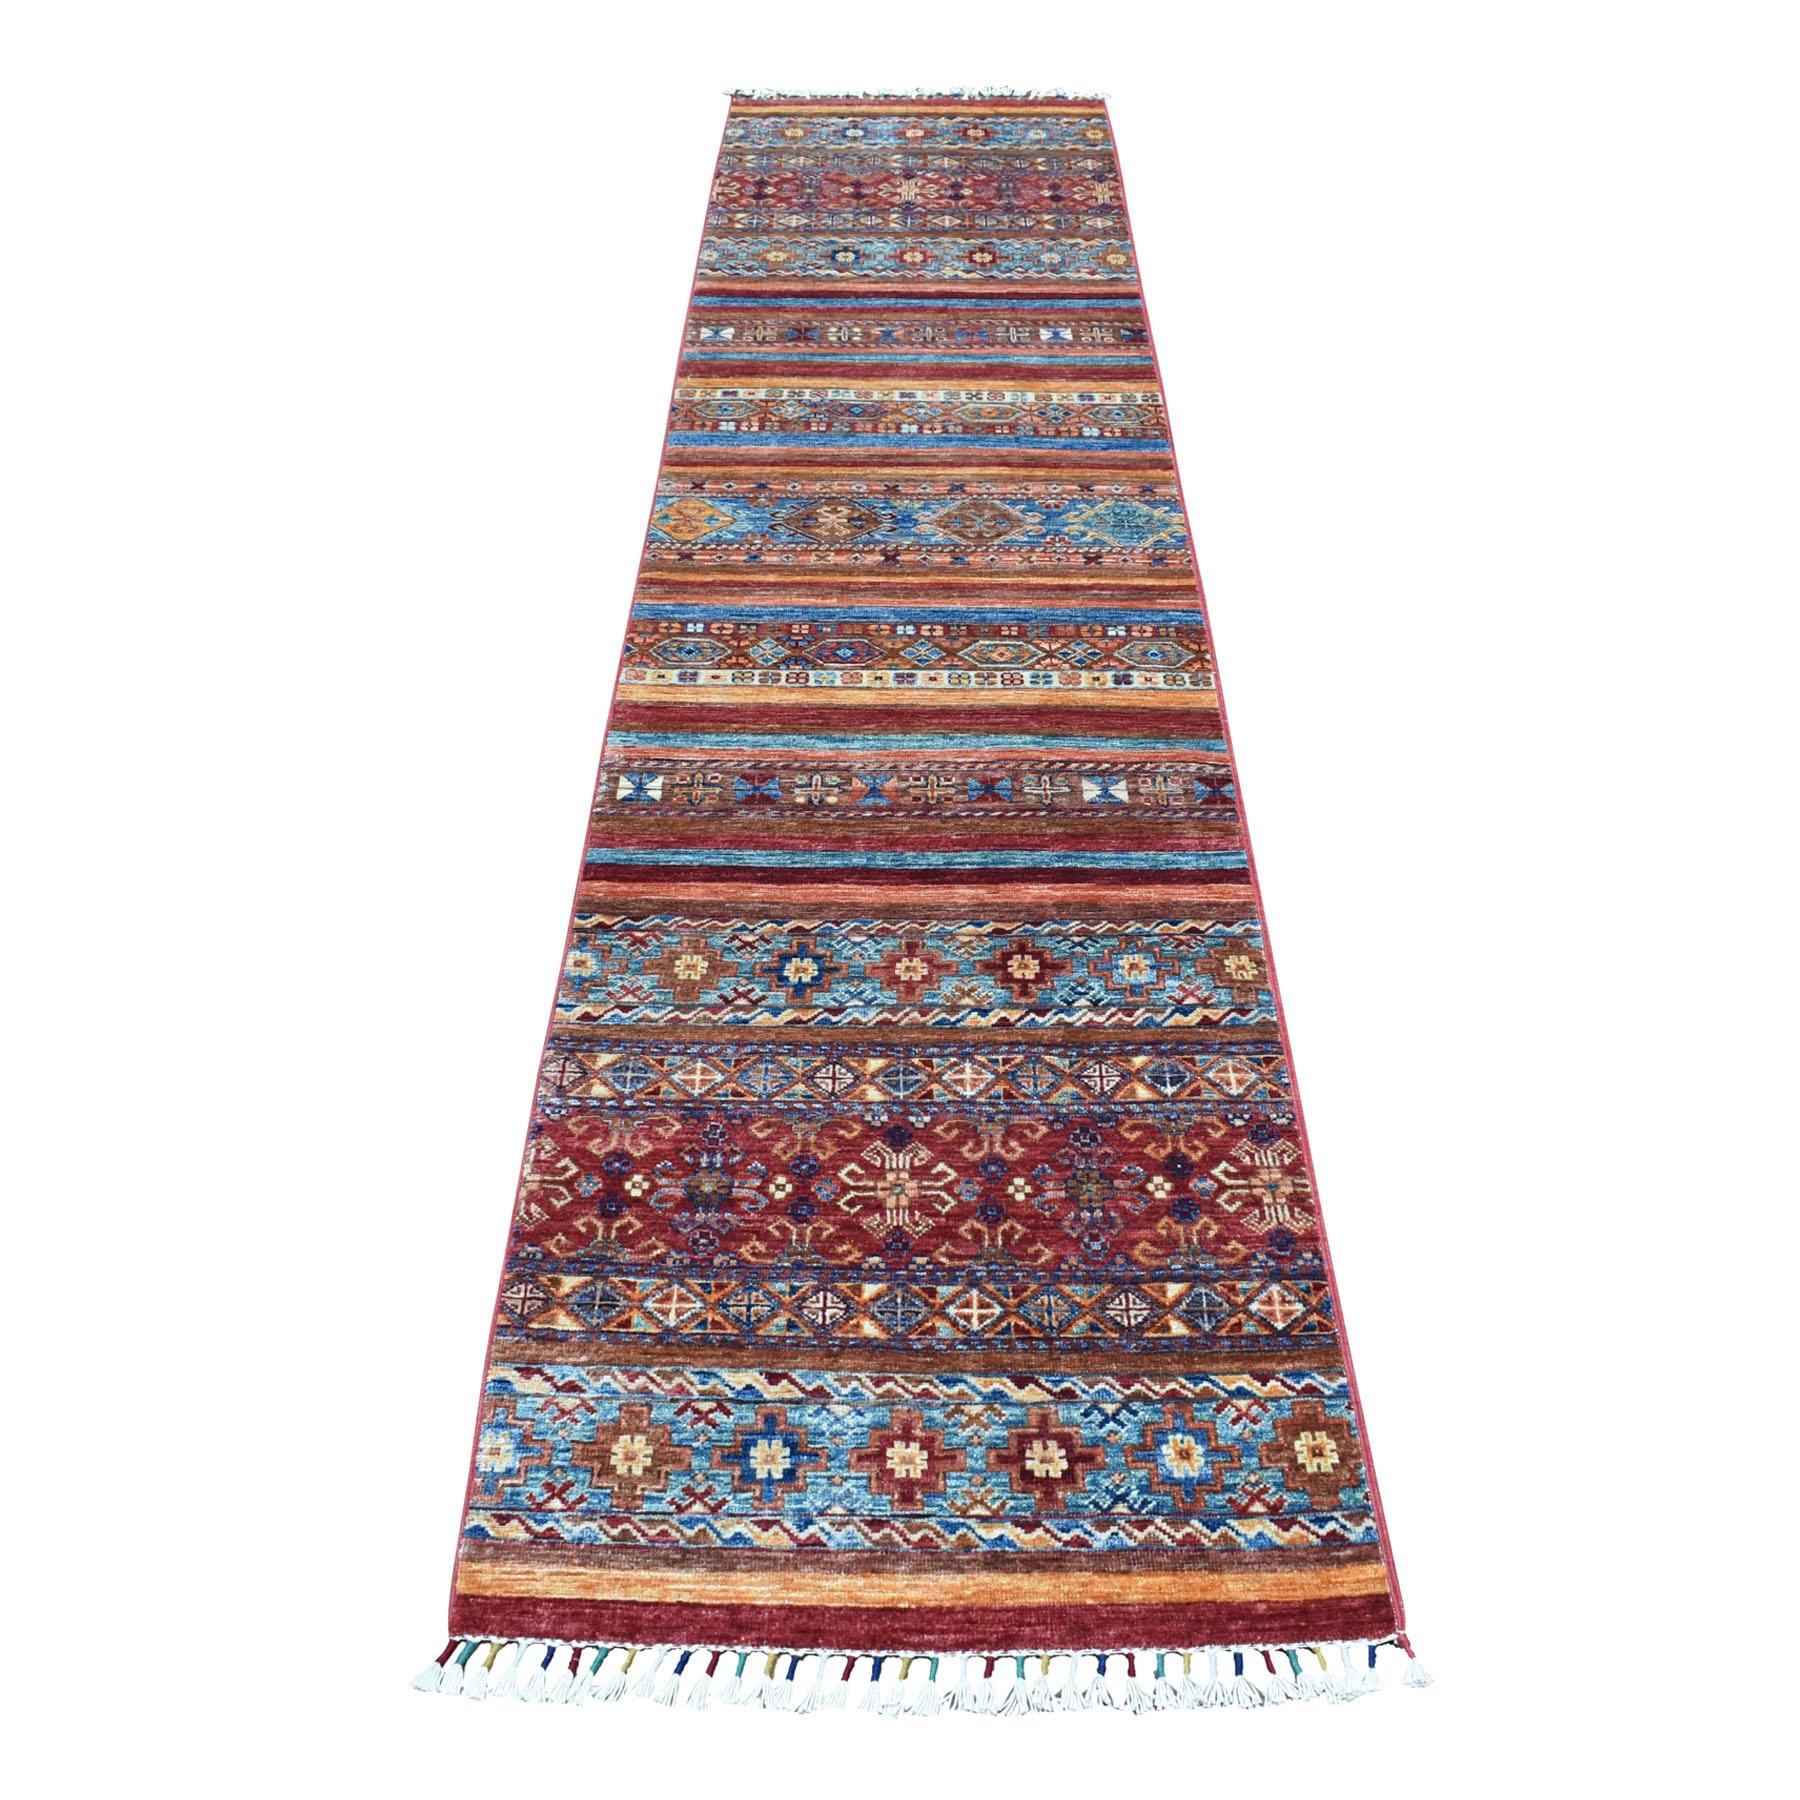 "2'4""x10'3"" Khorjin Design Colorful Super Kazak Pure Wool Runner  Hand Knotted Oriental Rug"